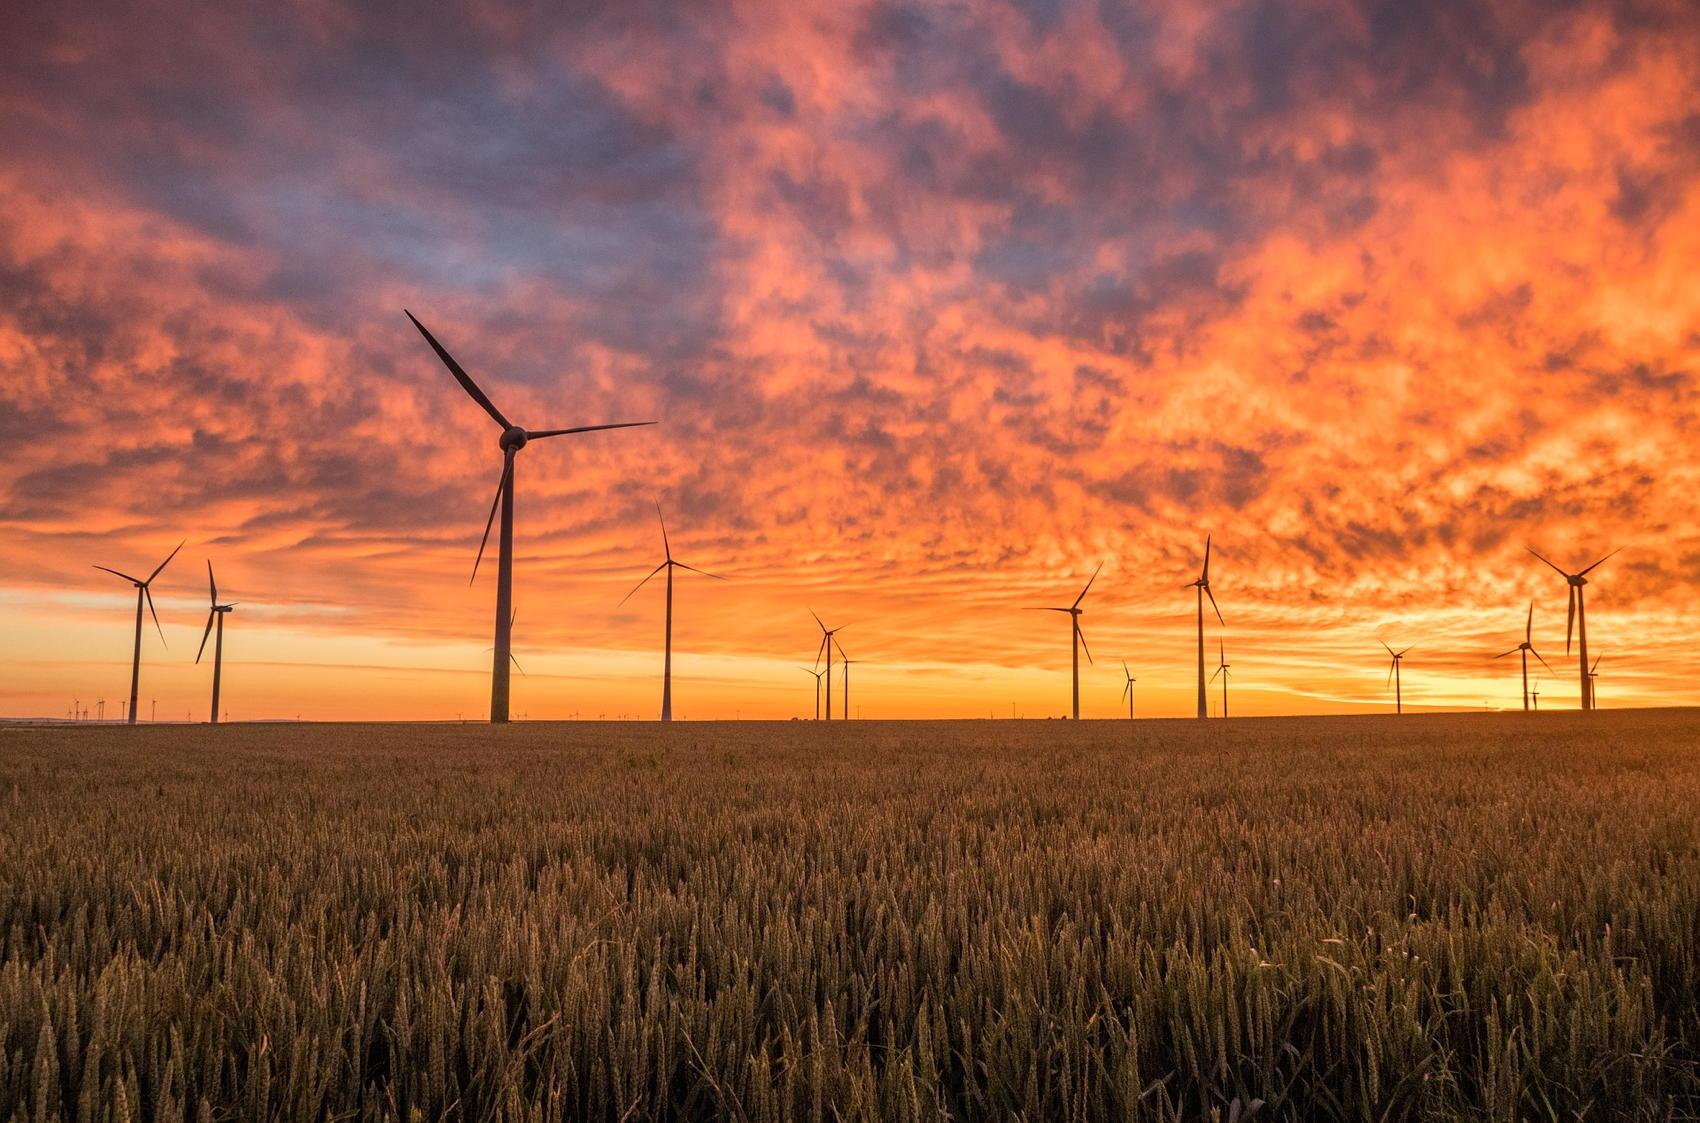 Wind Turbines - Image by Pexels